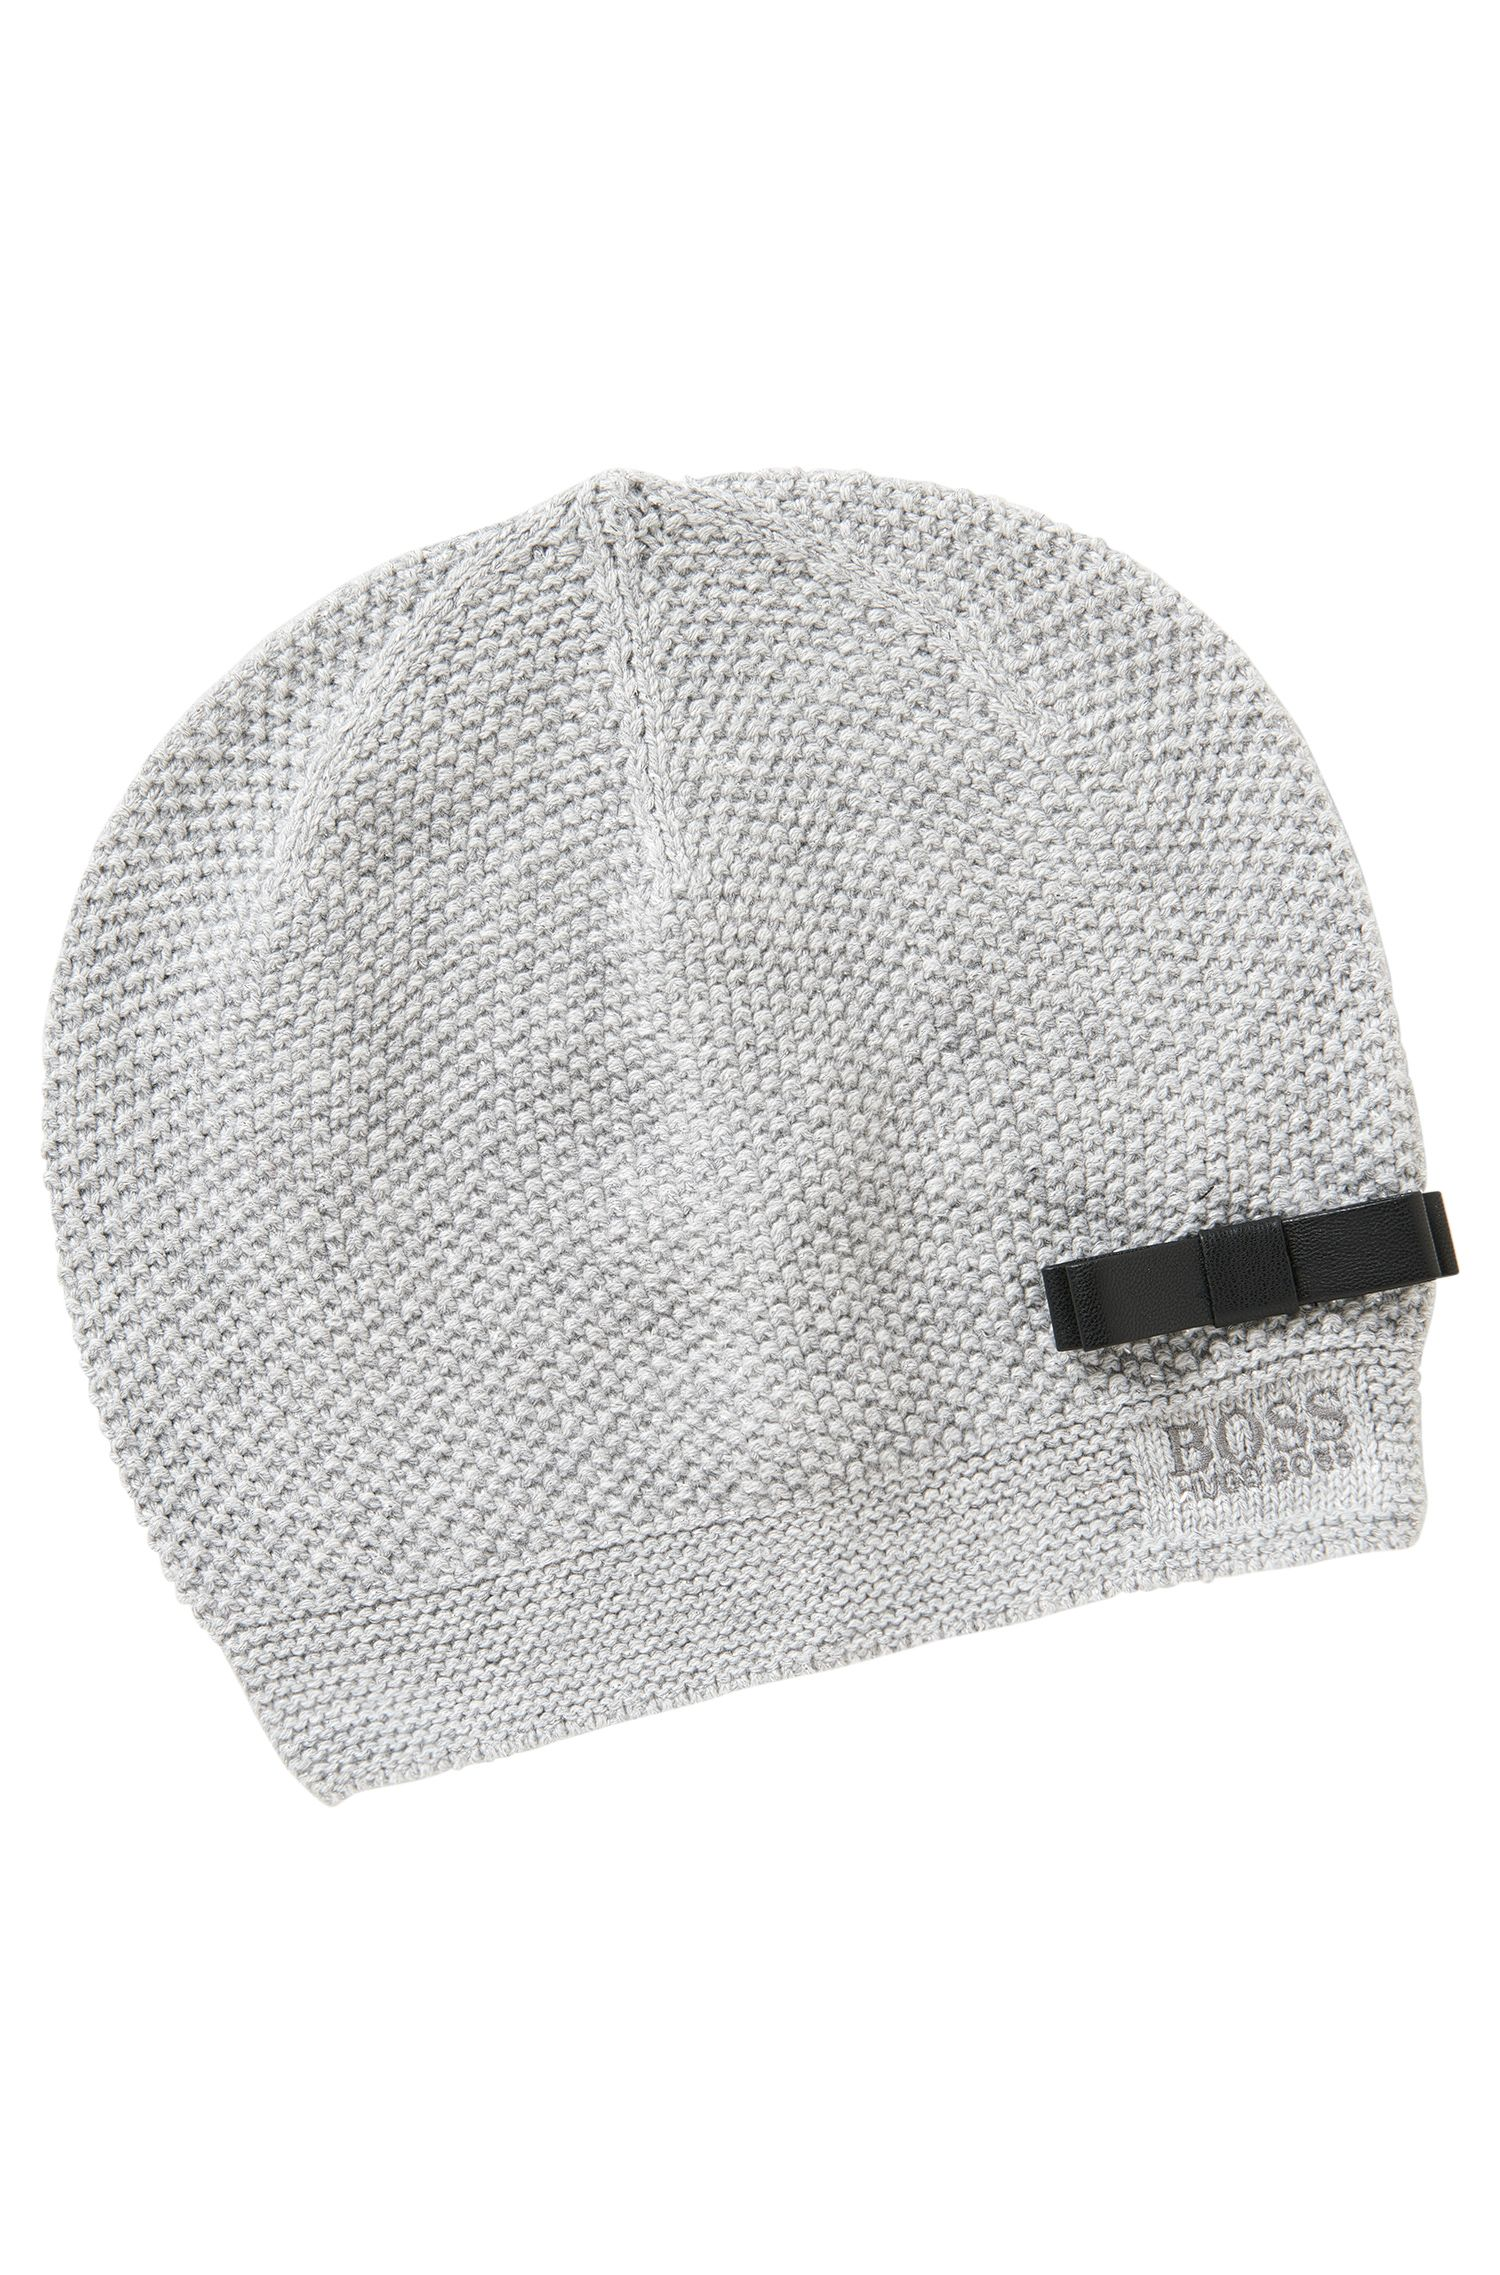 Kids-Mütze aus Baumwoll-Mix: 'J11065'